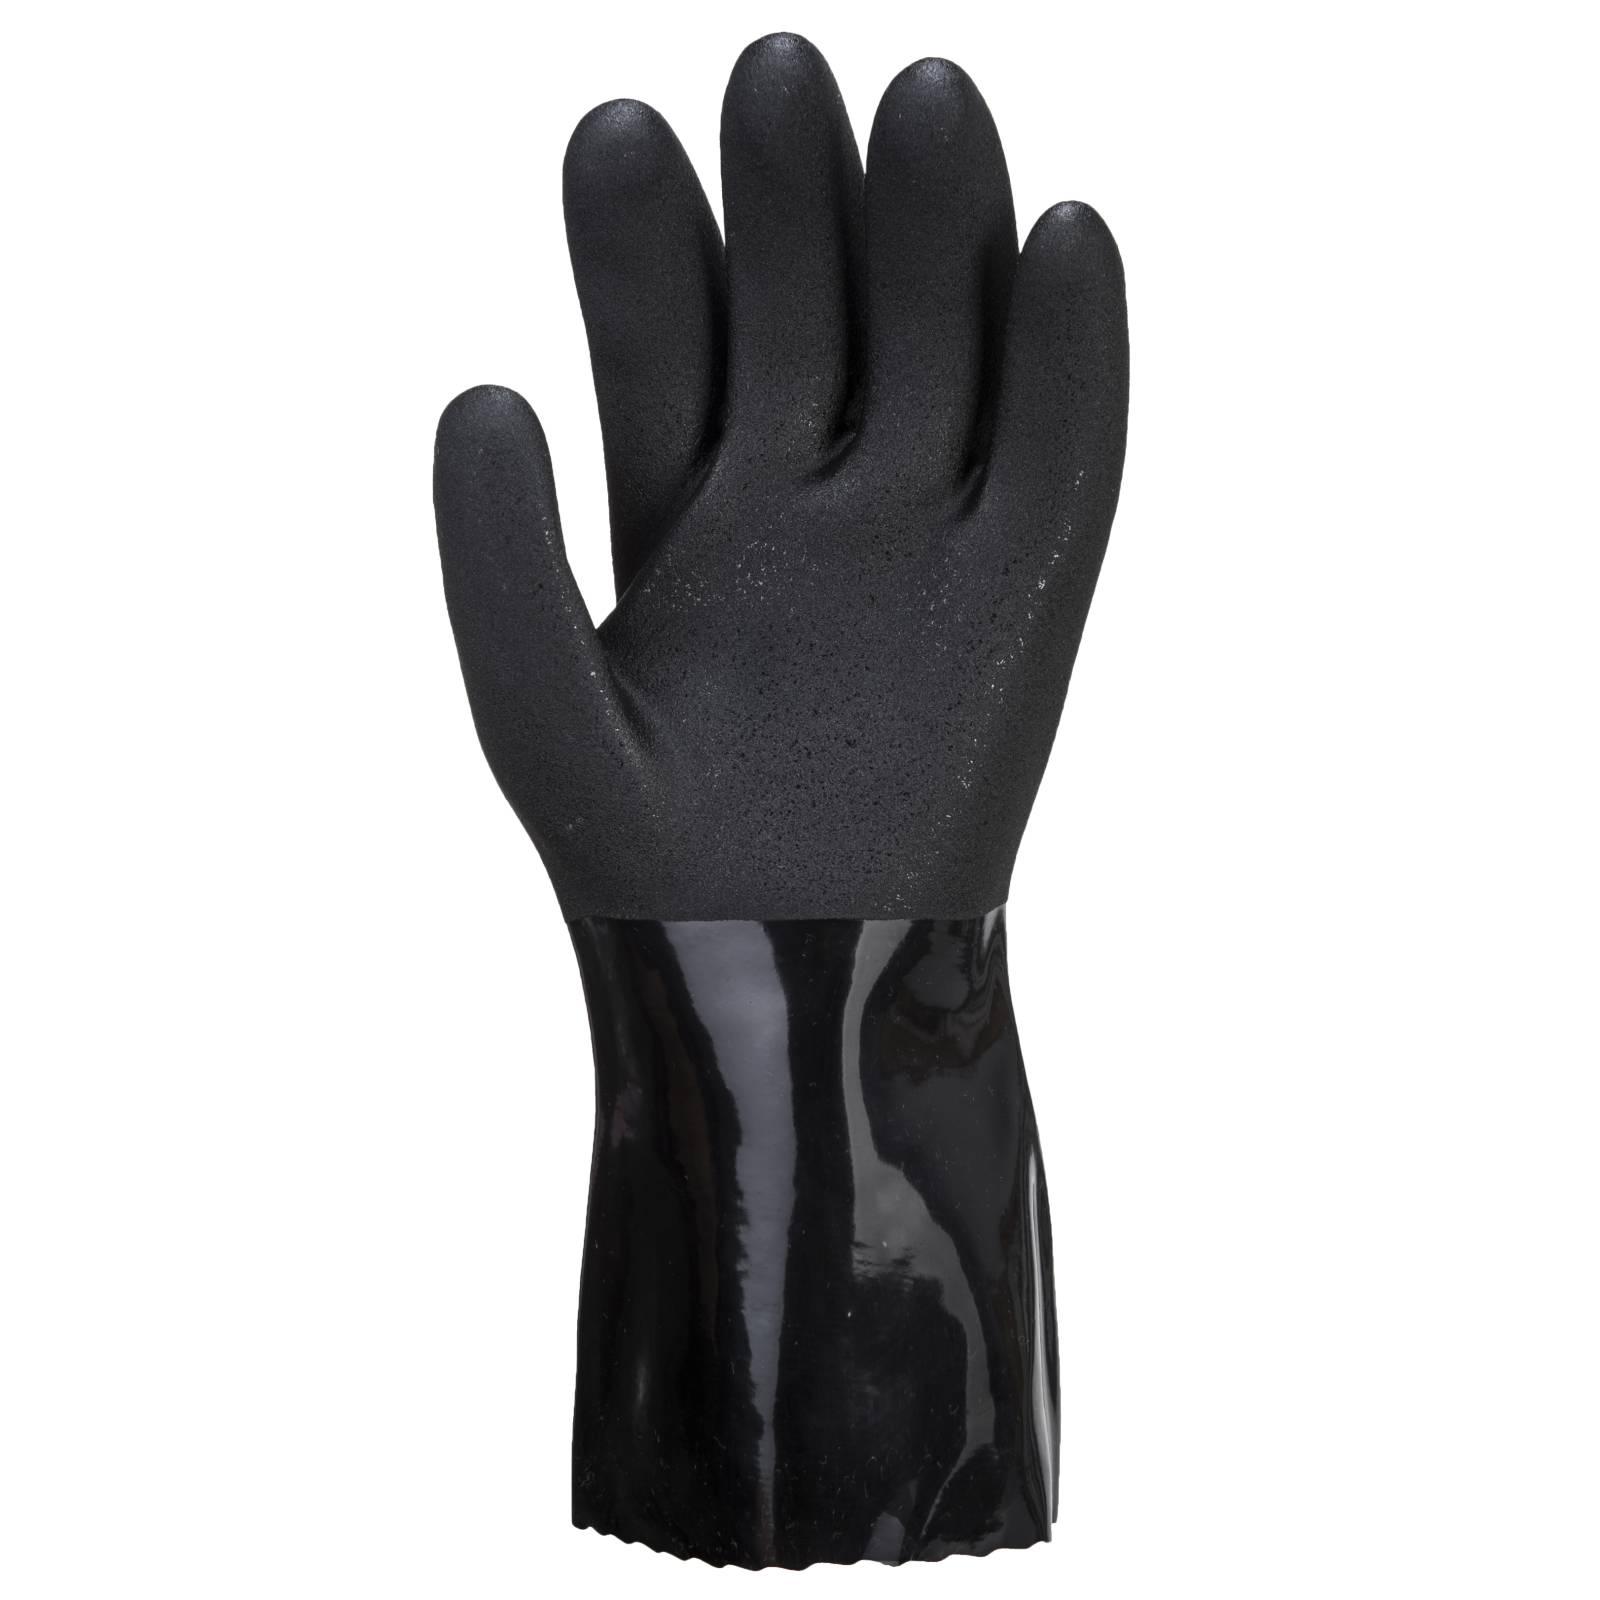 Portwest Handschoenen A882 ESD- antistatisch black(BK)